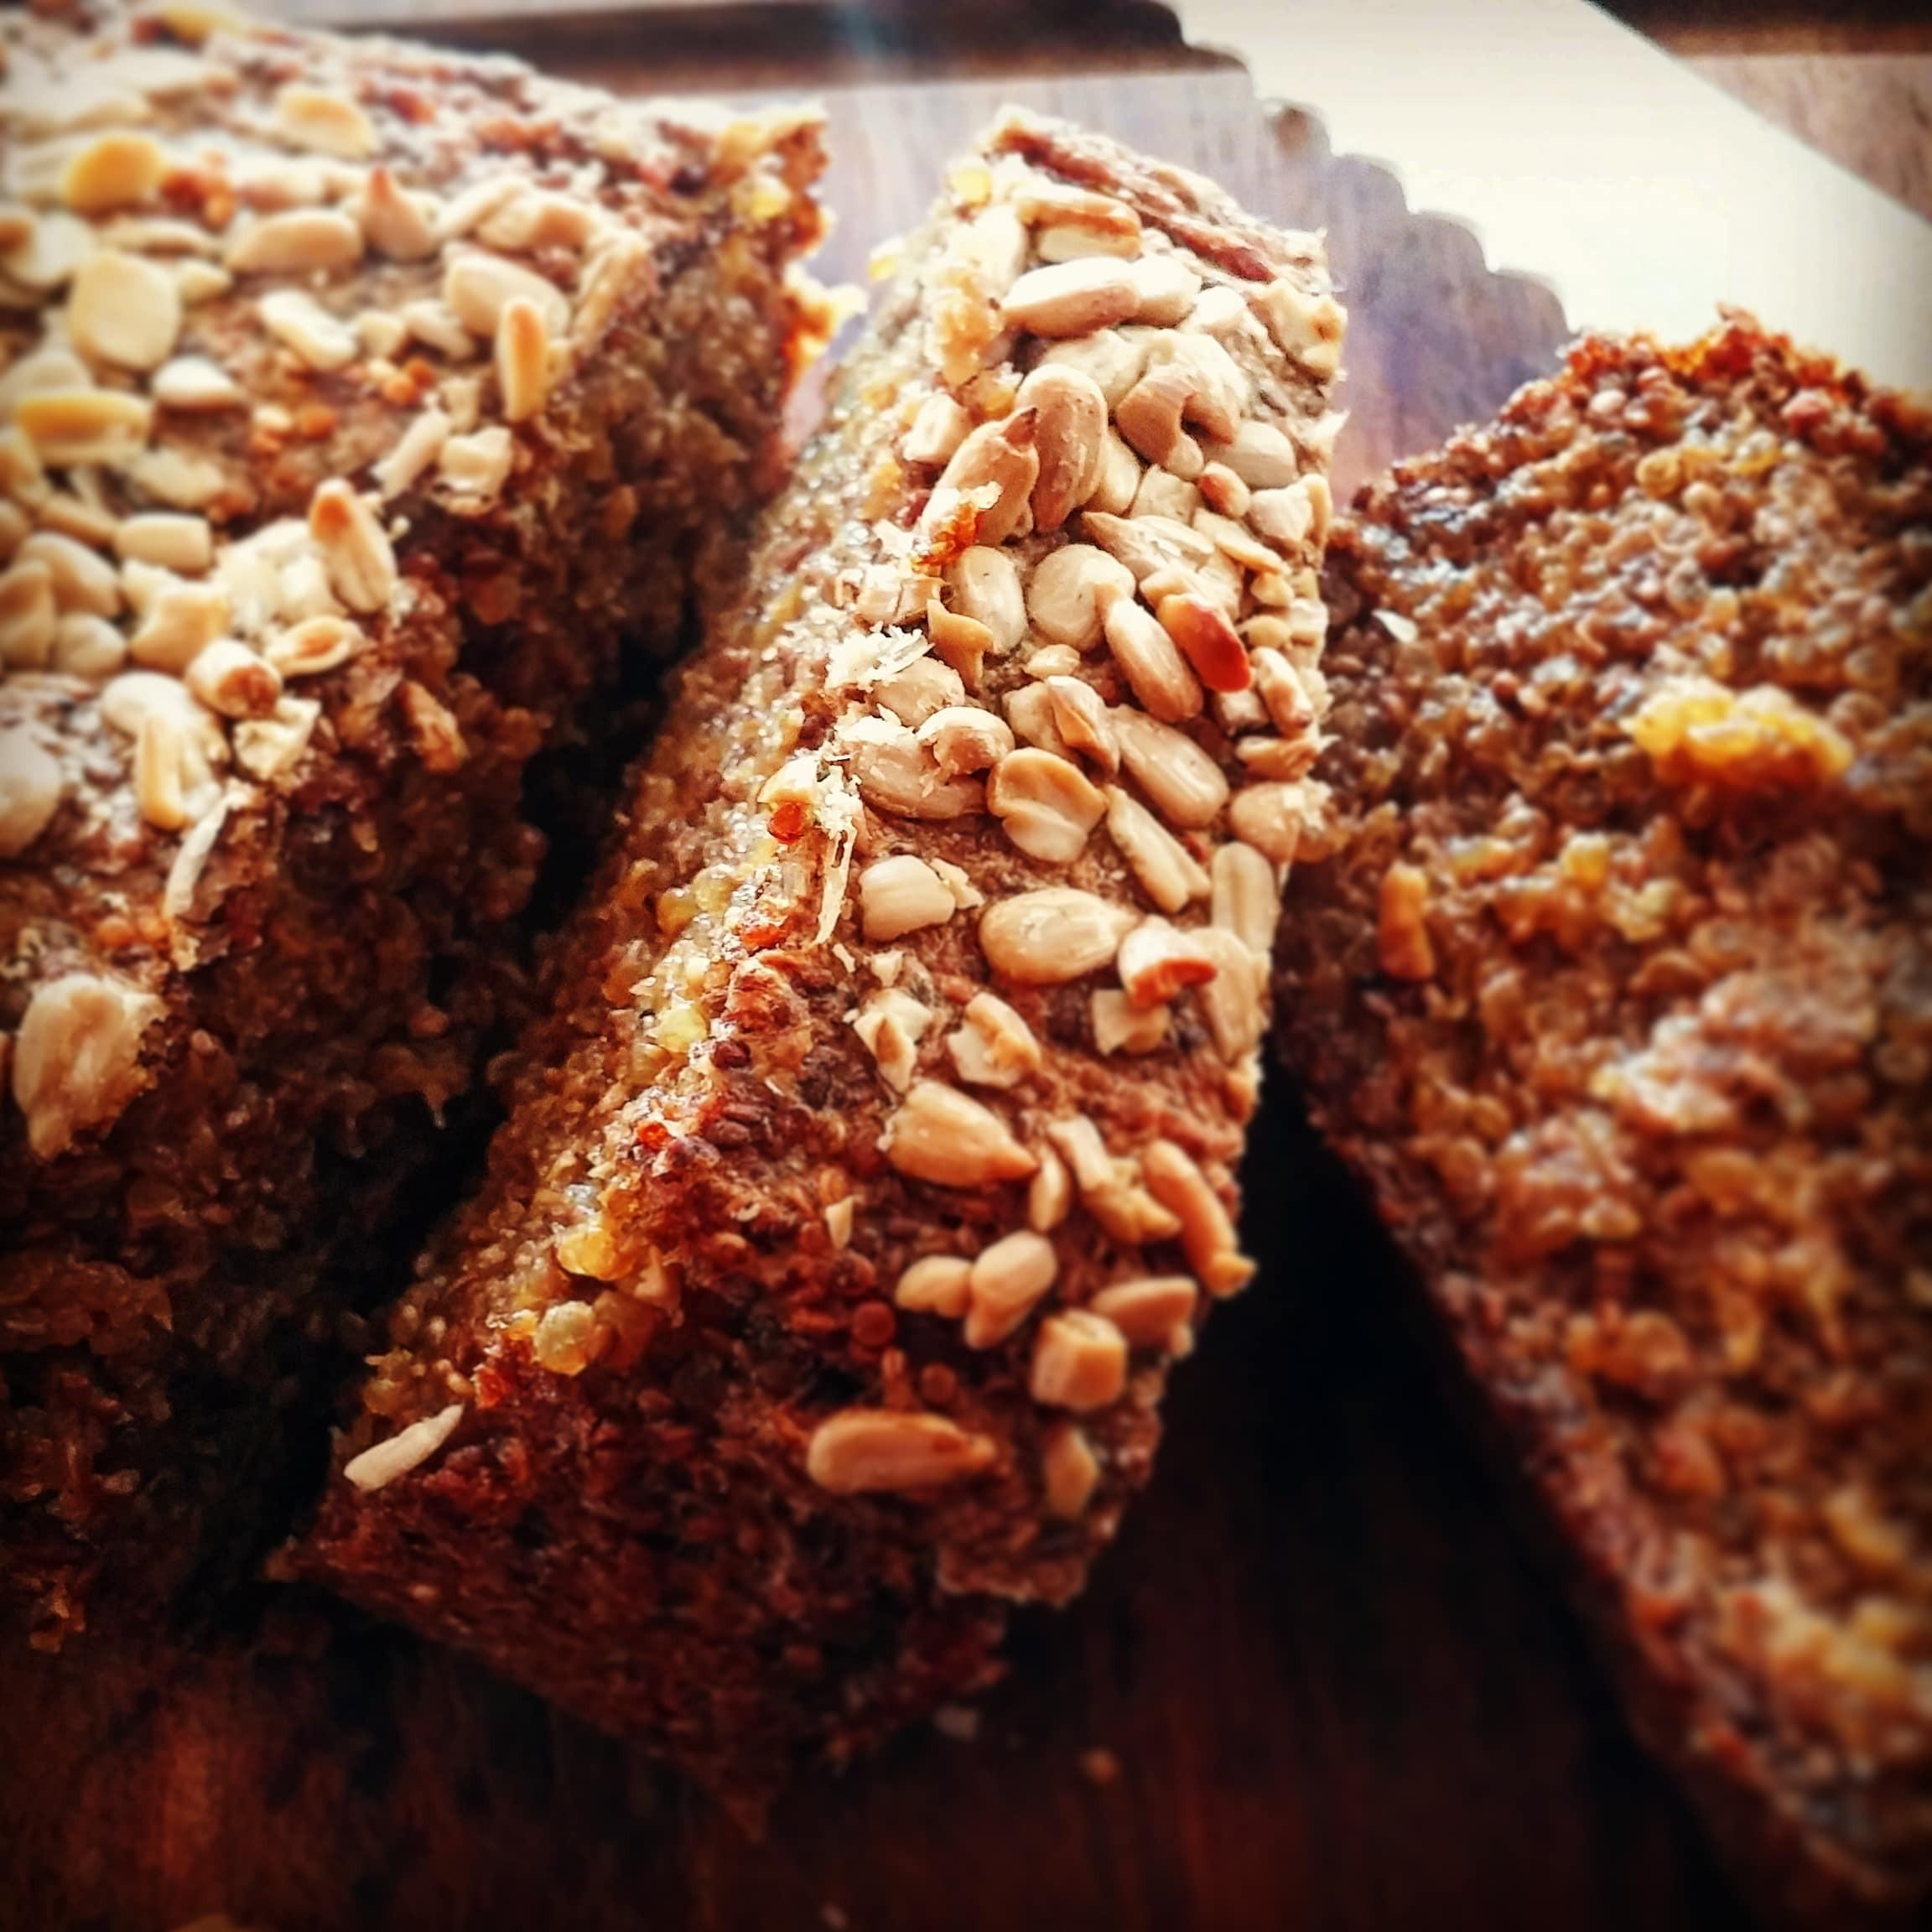 Gluten Free Quinoa Bread  Gluten Free Quinoa Bread Recipe [Vegan] Veggie Savvy